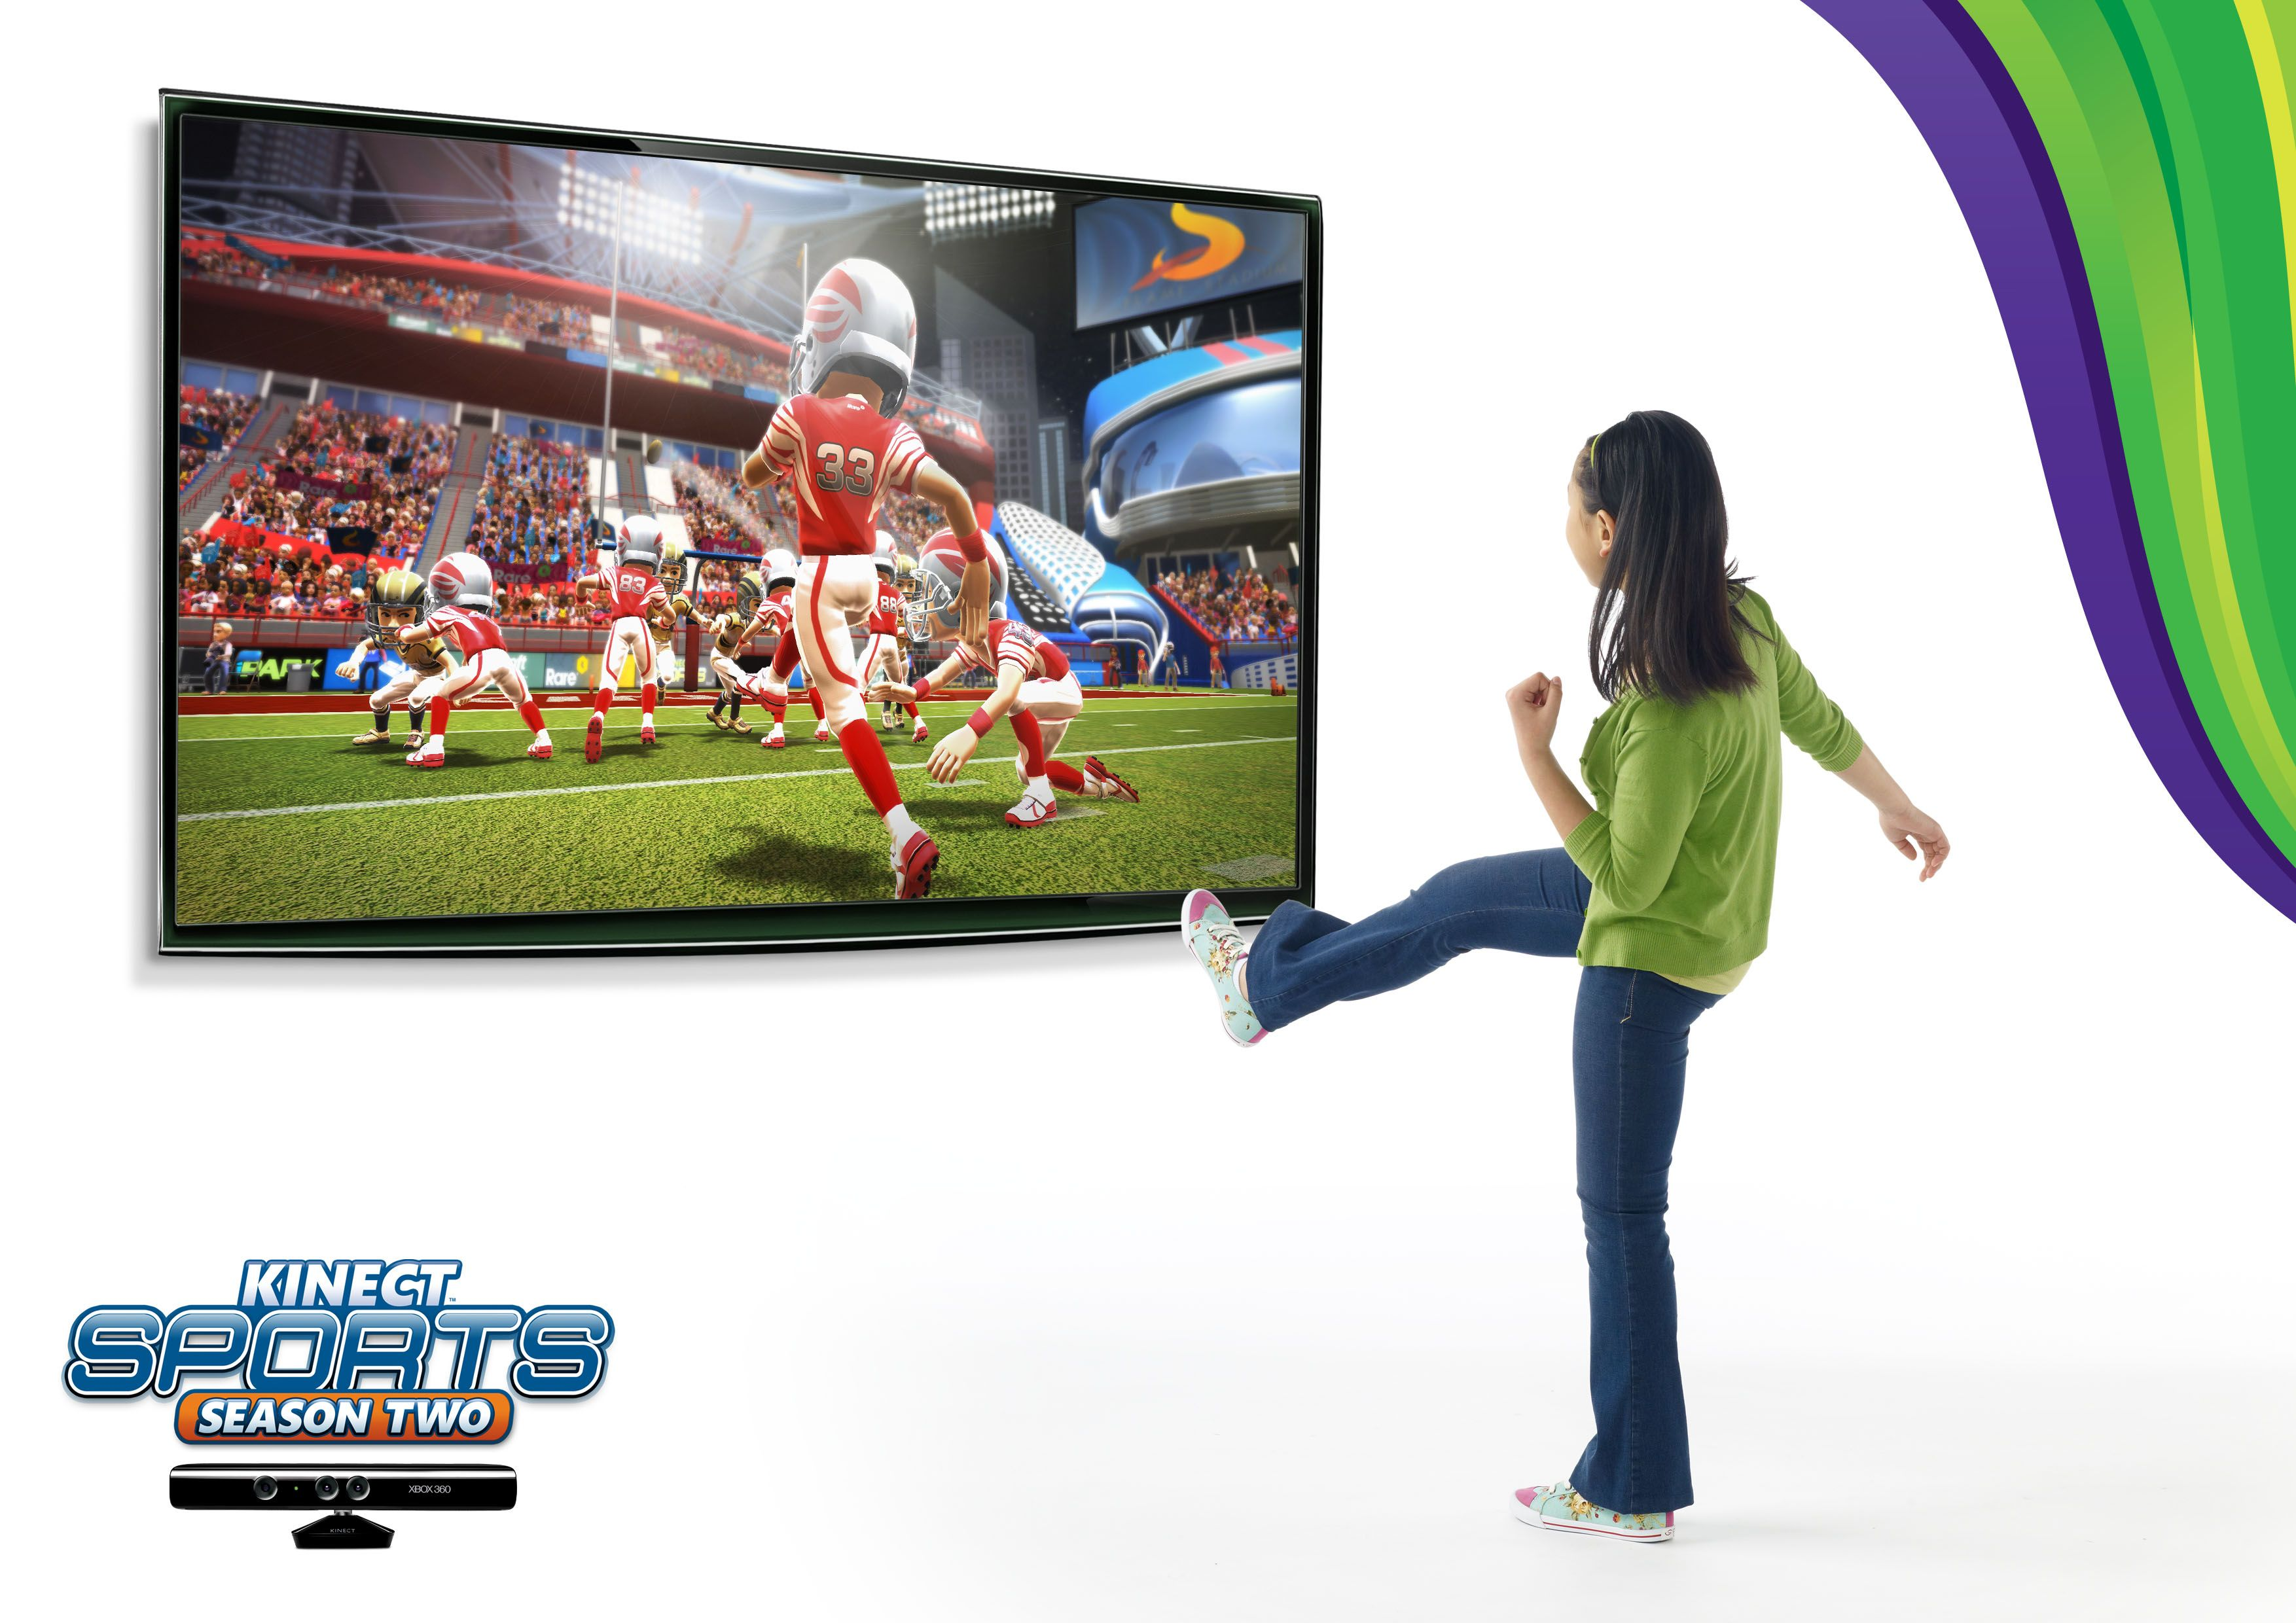 Kinect Sports: Season Two - Kinect Sports: Season Two